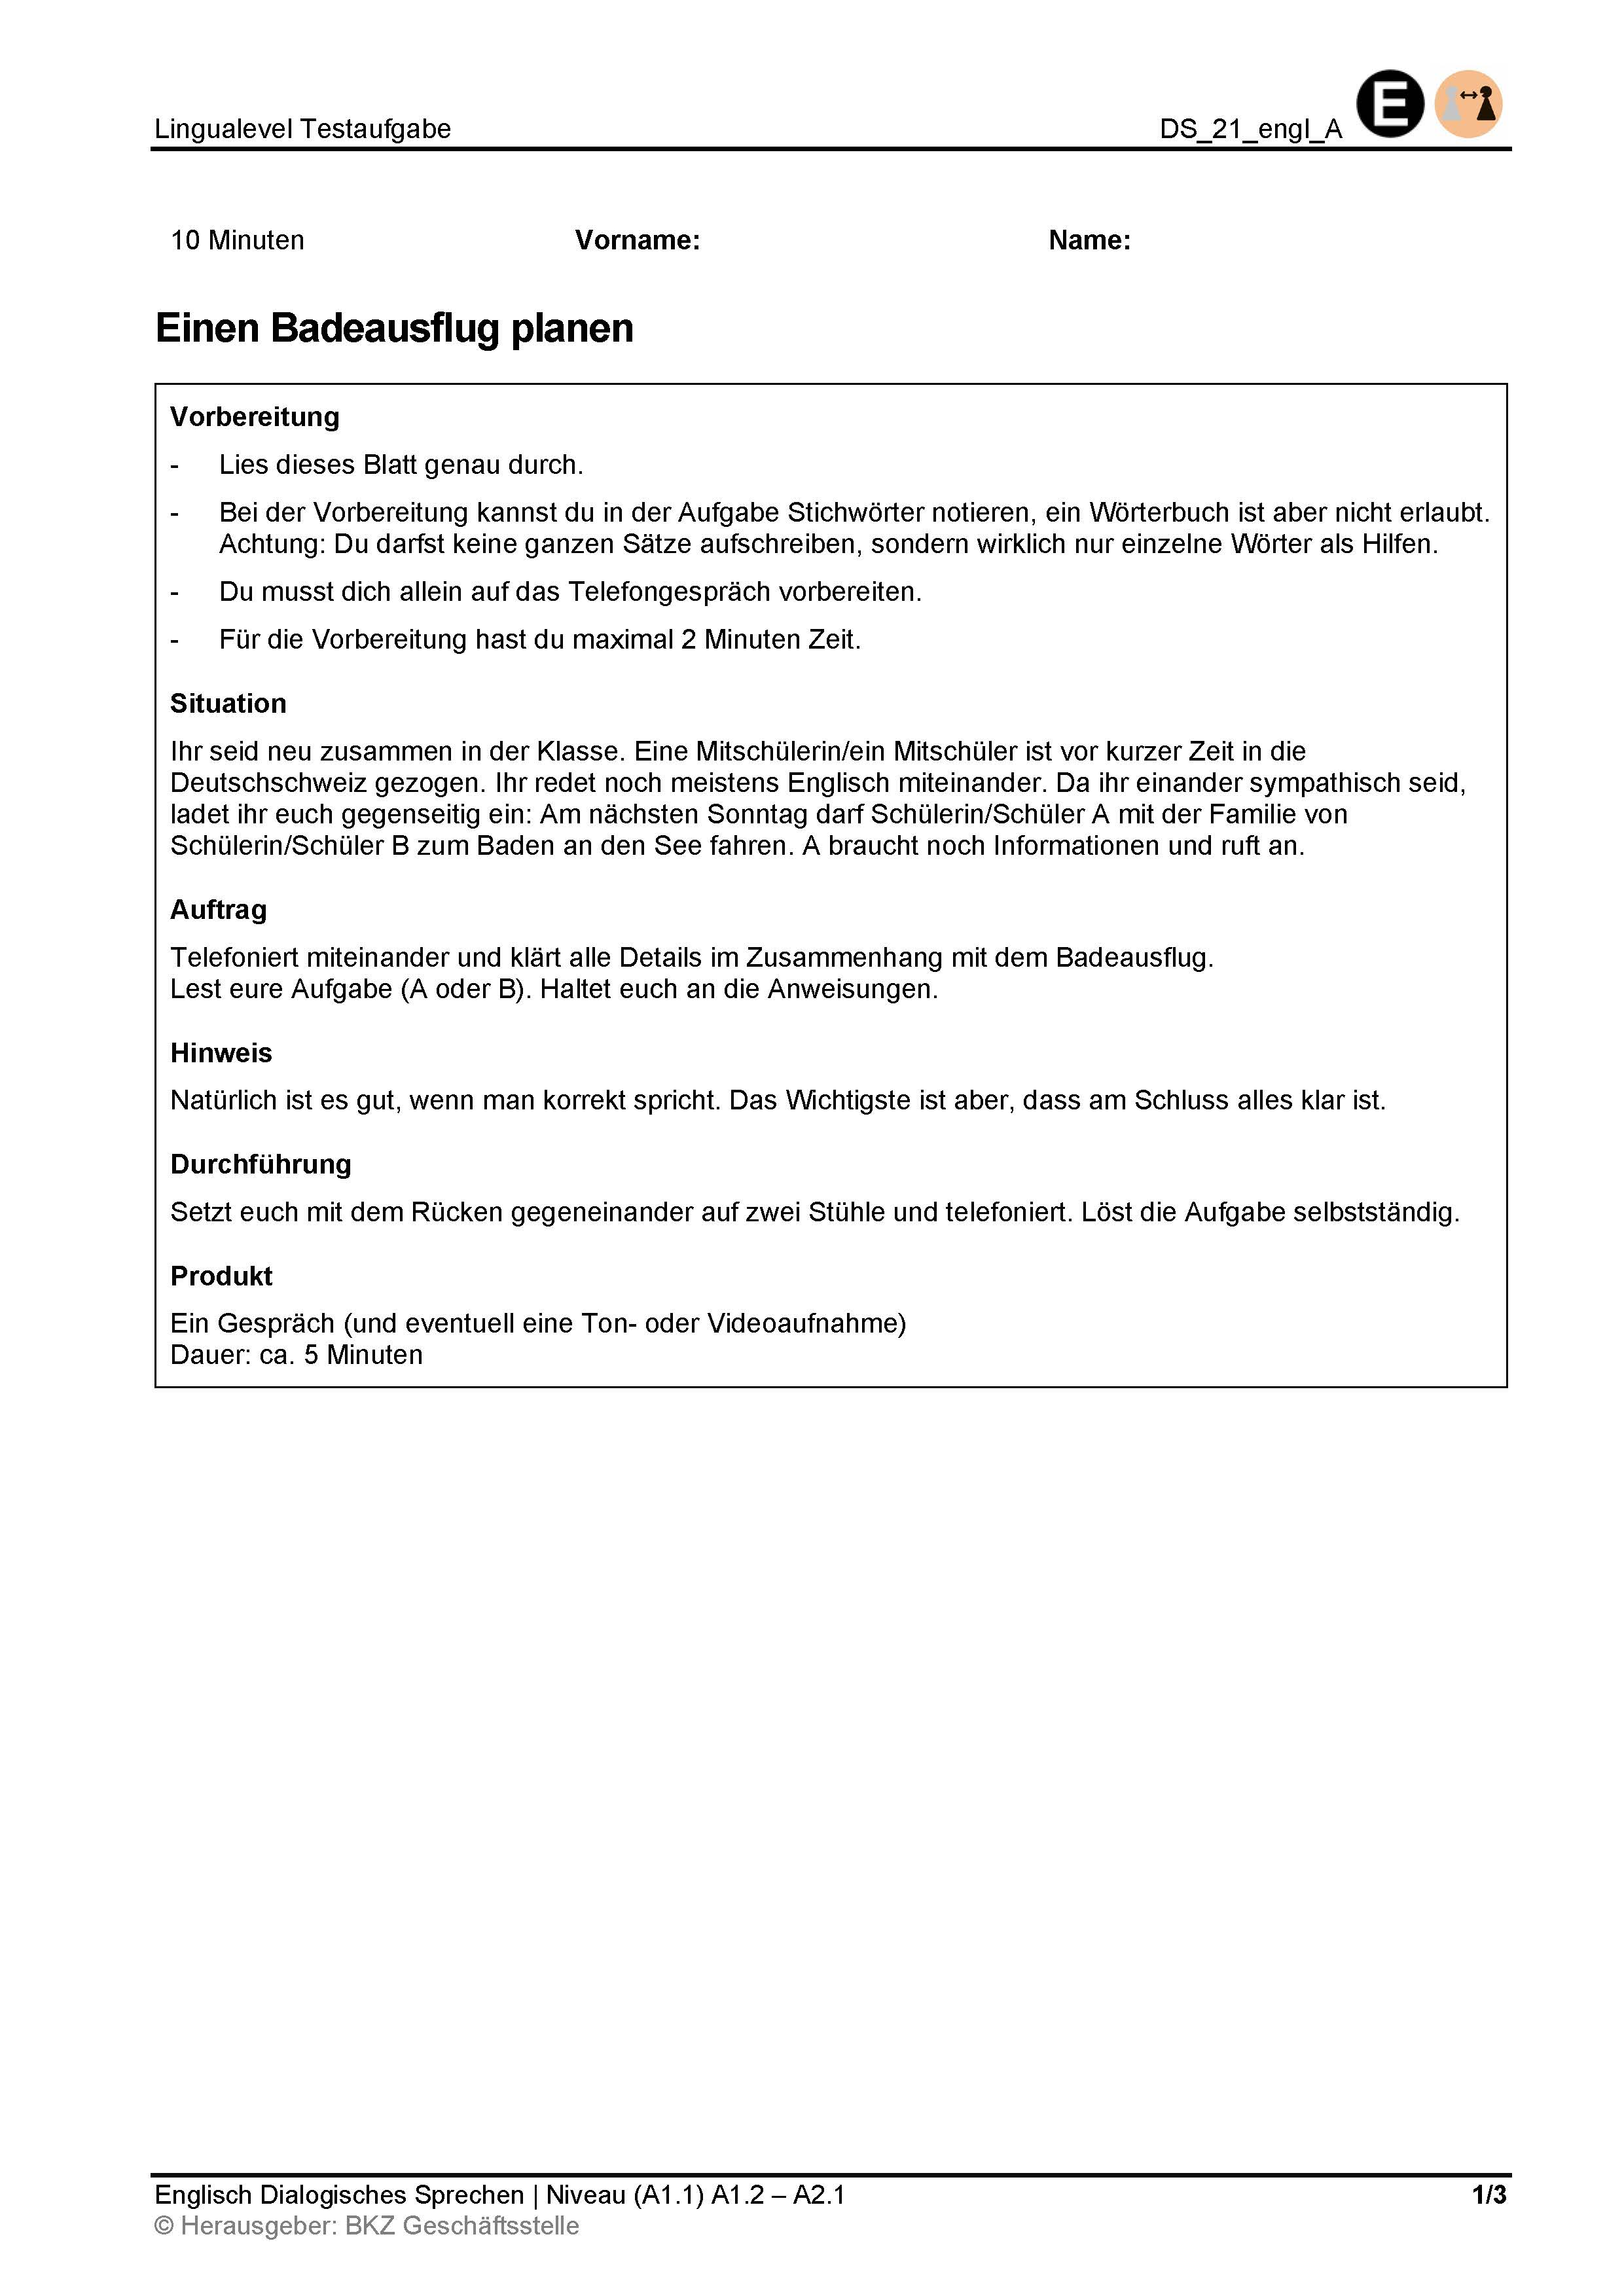 Preview image for LOM object Dialogisches Sprechen: Einen Badeausflug planen